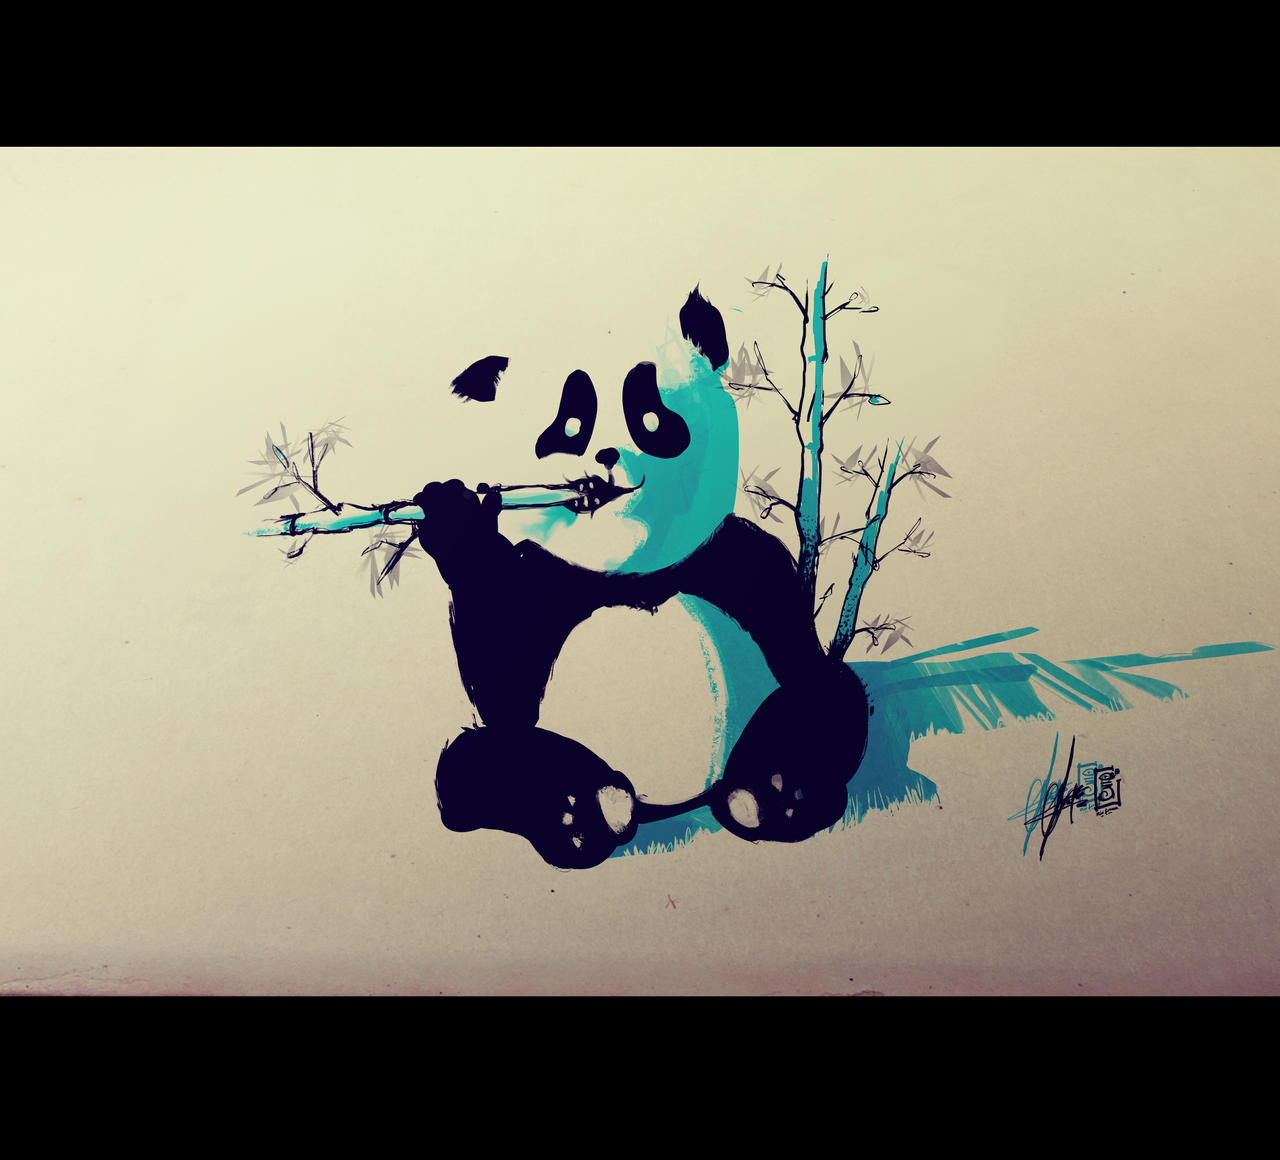 Panda Flash tattoo by RemiisMeltingDots on DeviantArt